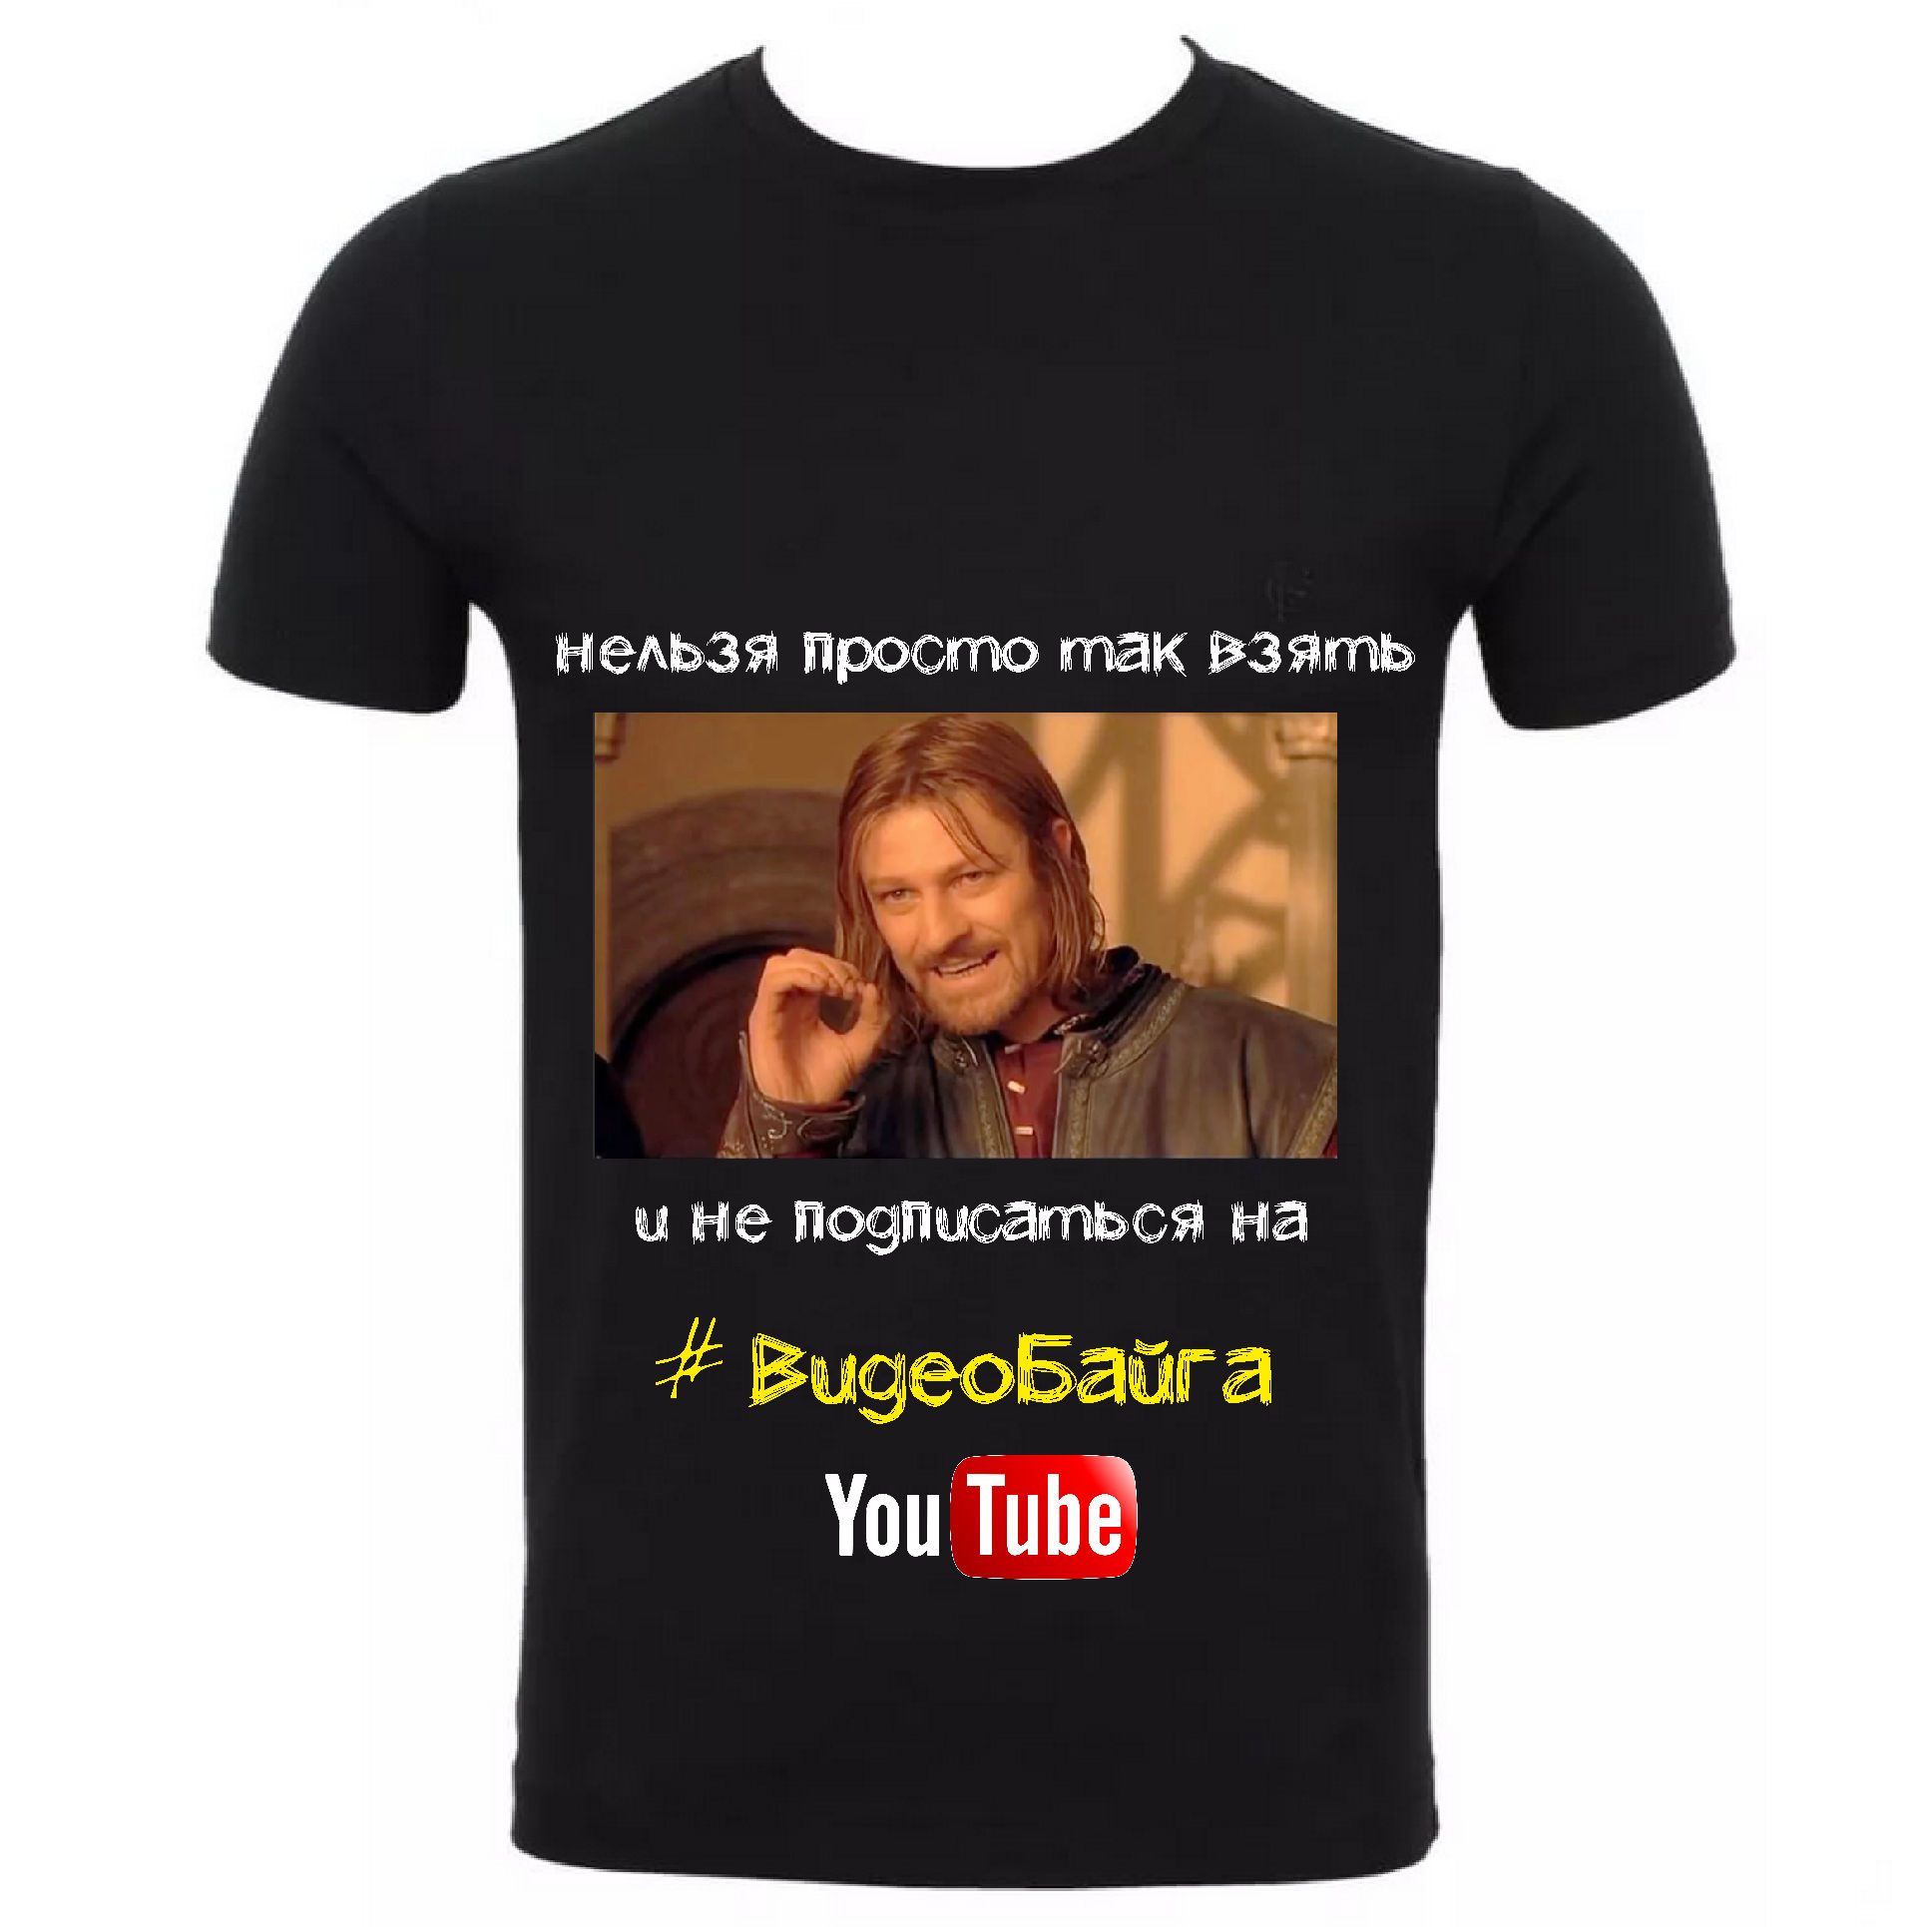 Дизайн принта на футболки для фестиваля YouTube блогеров  фото f_4475b490e4b73a14.jpg